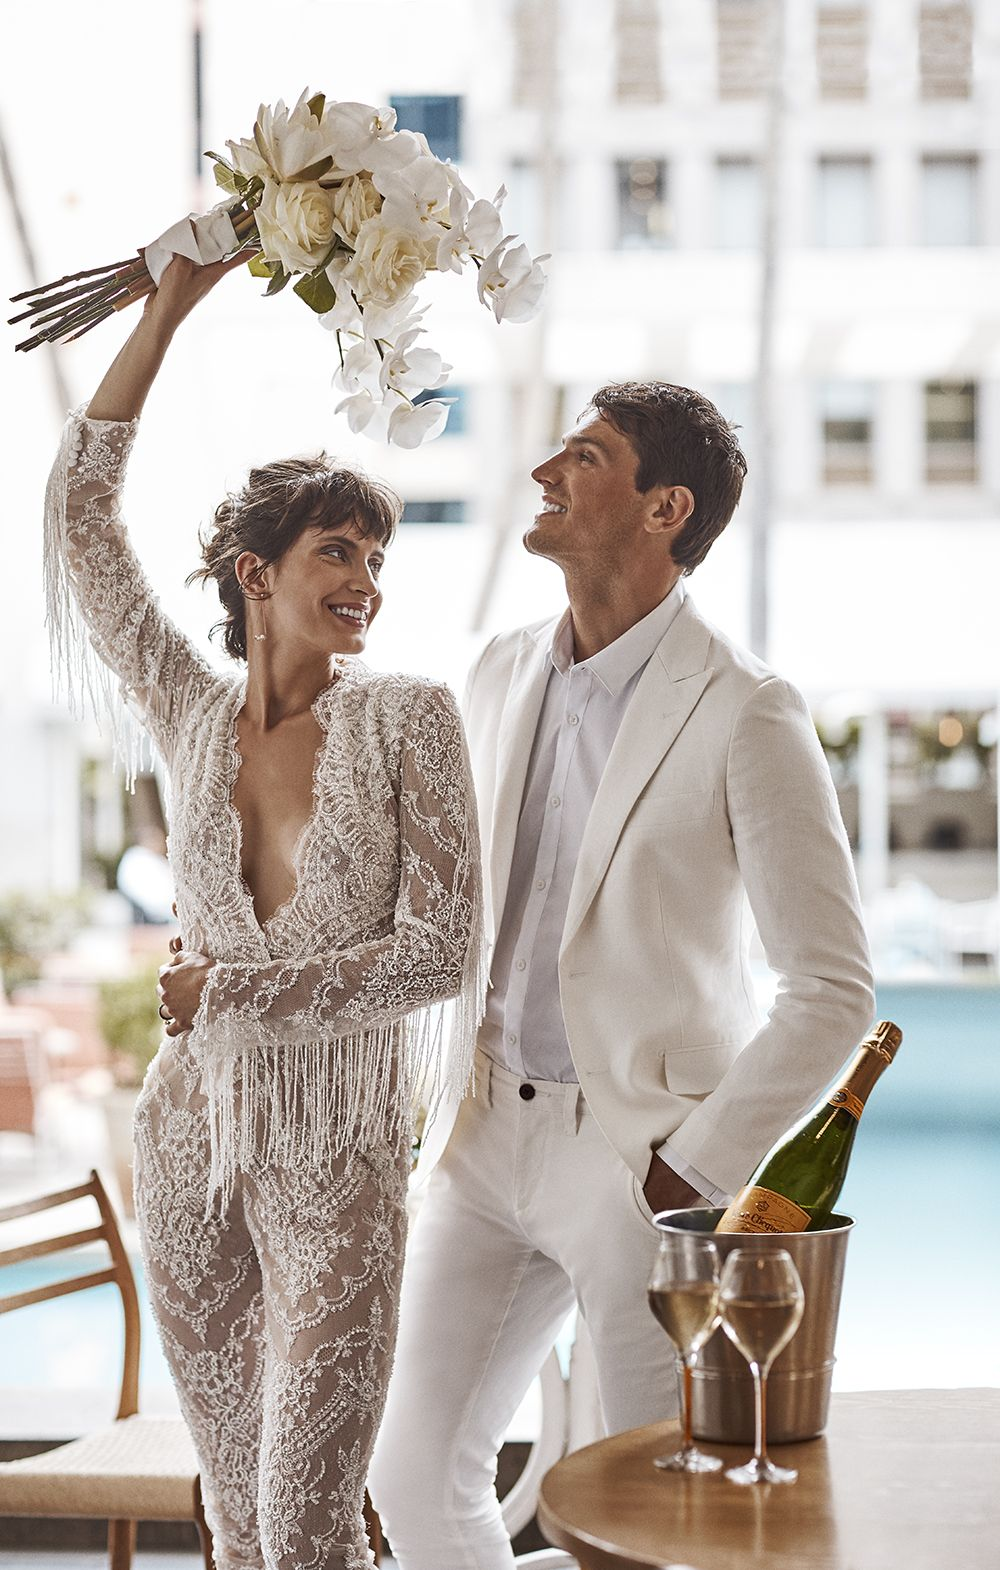 P johnson tailoring for merivale bridals 2019 campaign